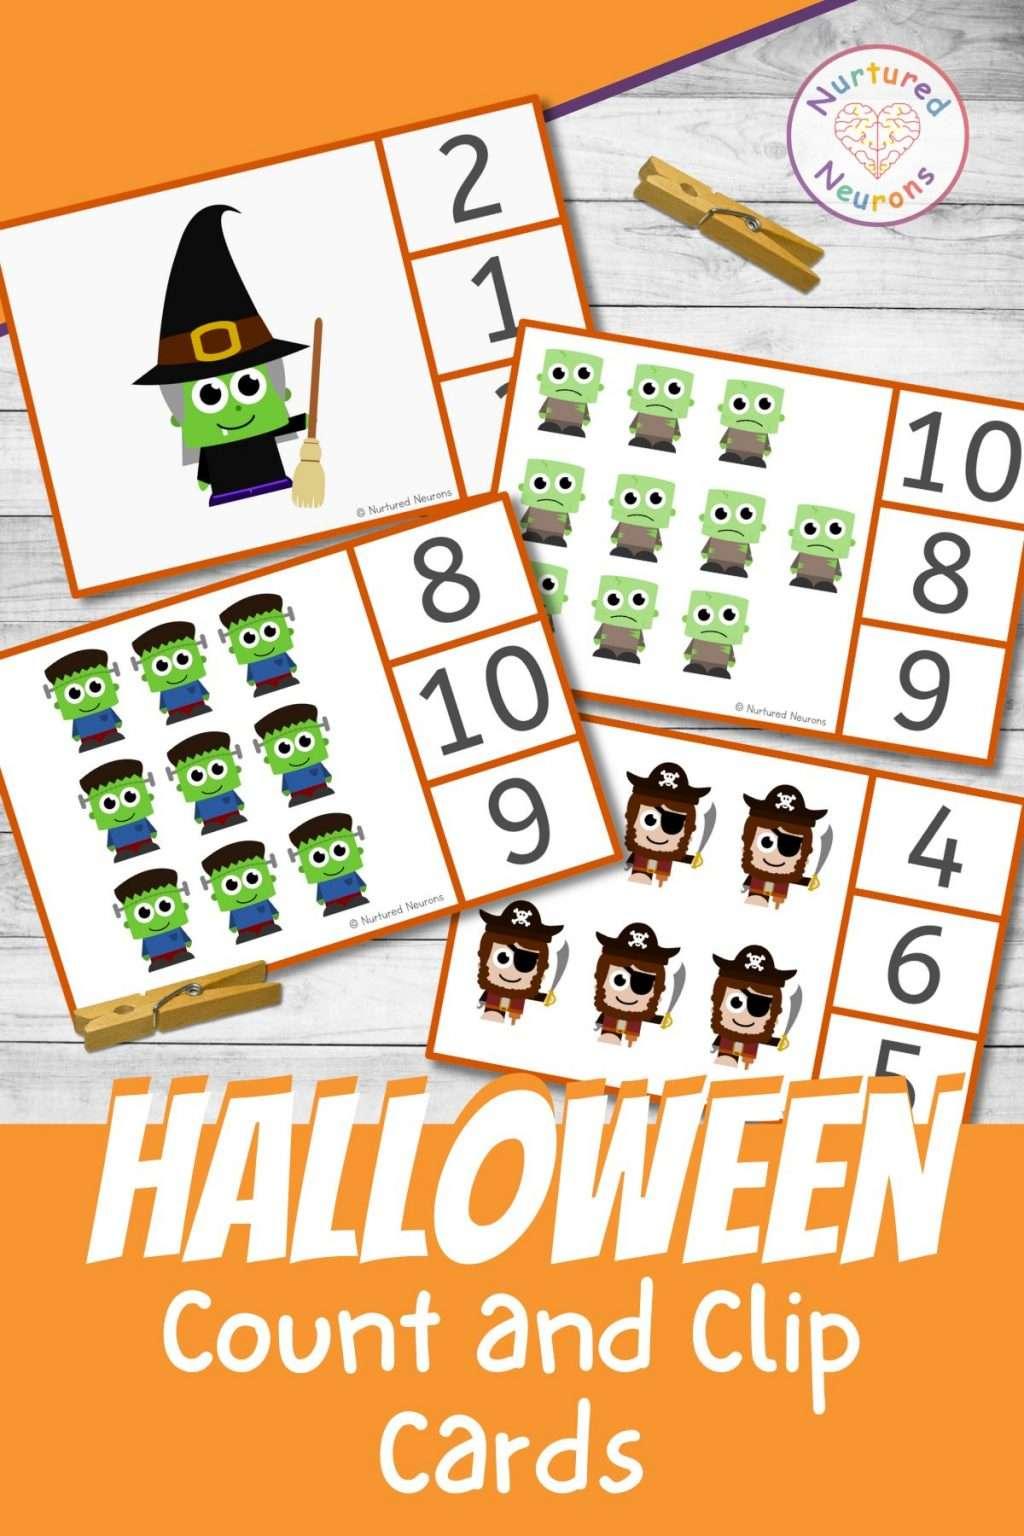 Preschool peg cards - kindergarten Halloween math counting printable clip cards